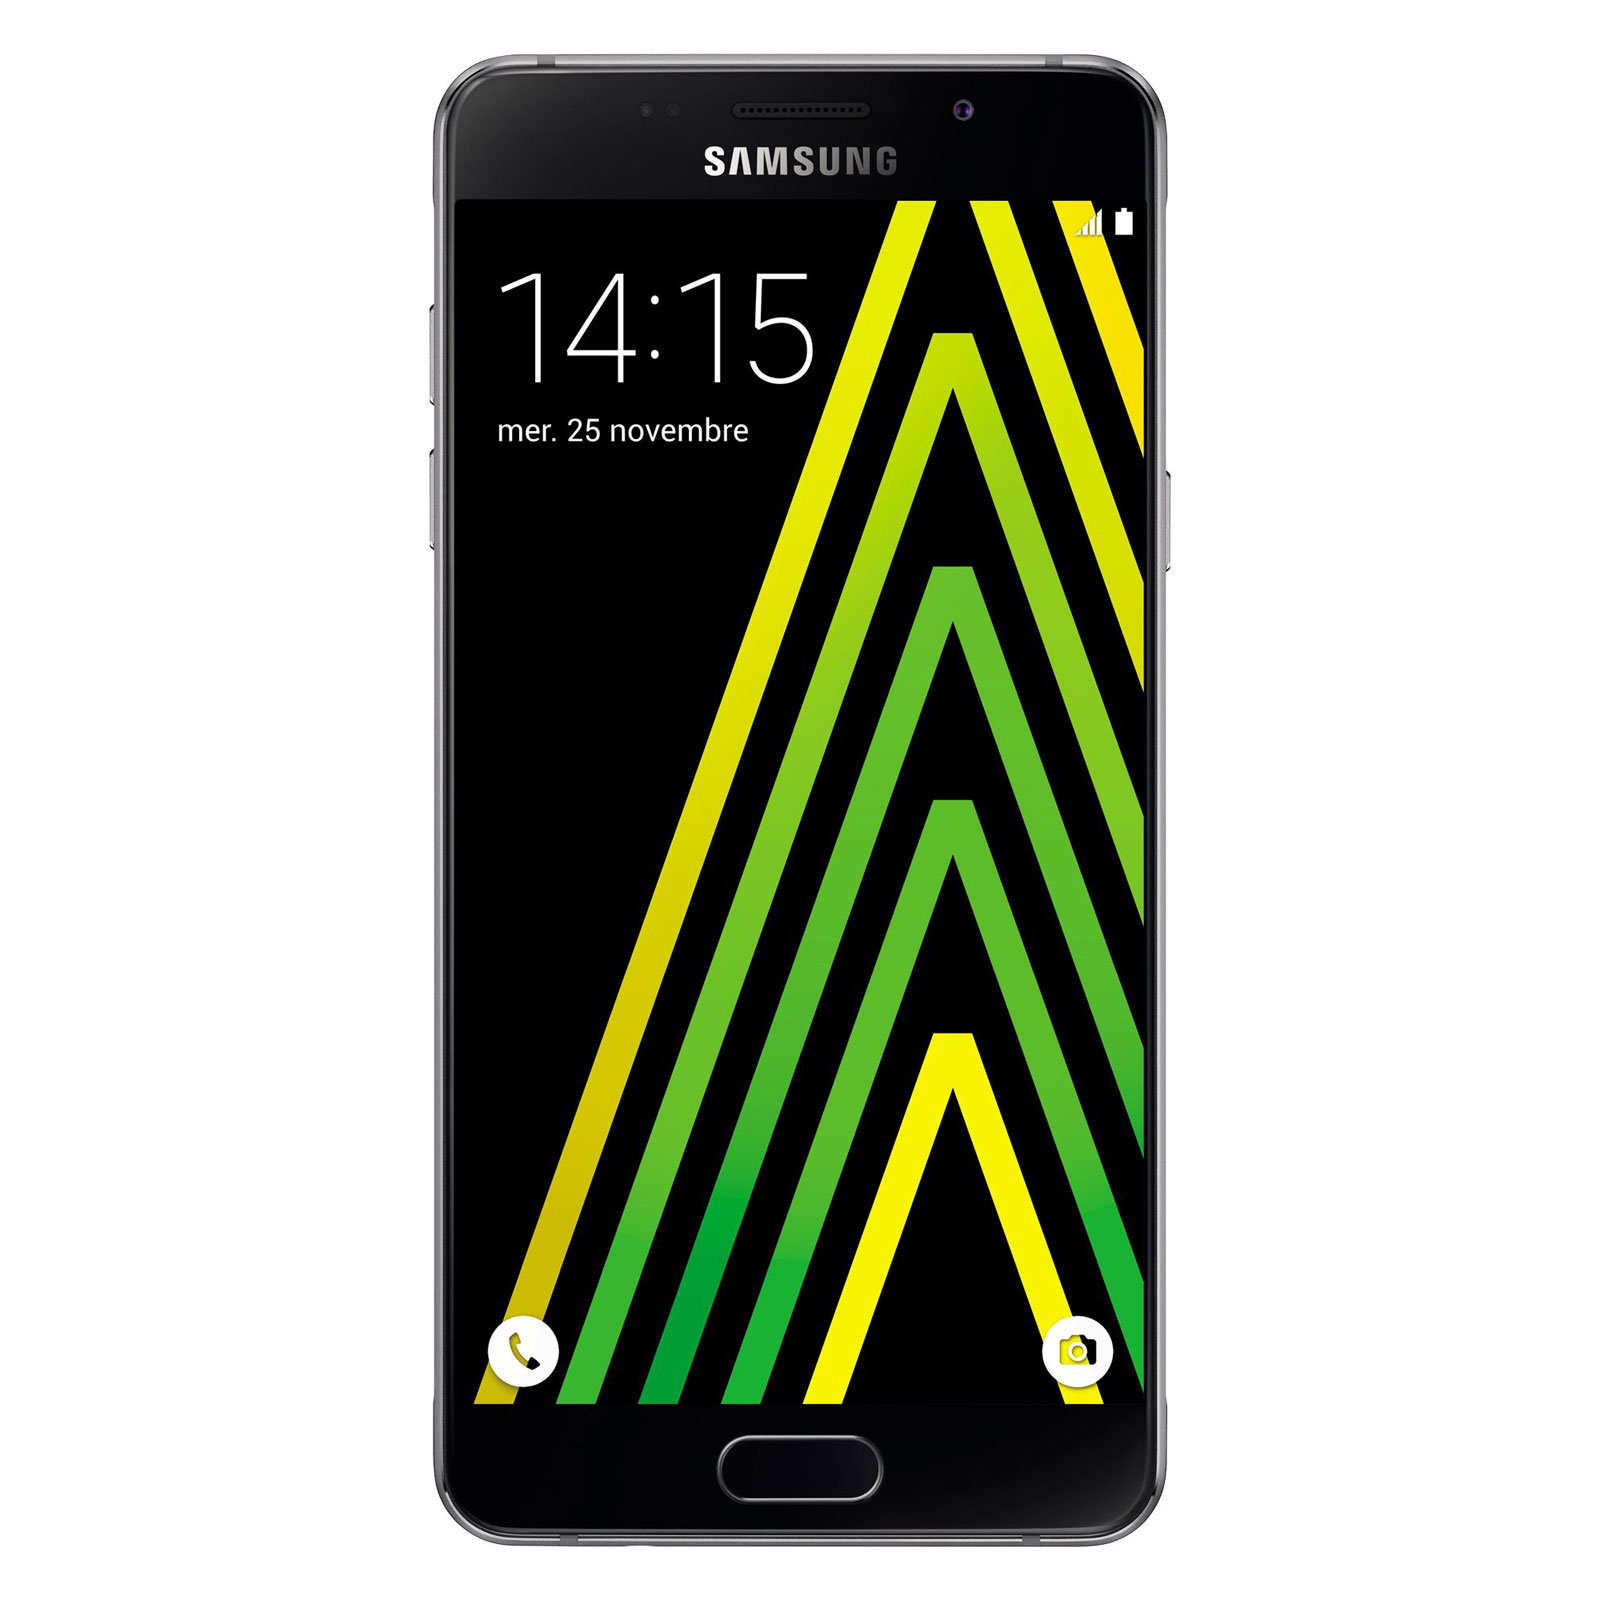 "Mobile & smartphone Samsung Galaxy A5 2016 Noir Smartphone 4G-LTE - Exynos 7580 8-Core 1.6 Ghz - RAM 2 Go - Ecran tactile 5.2"" 1080 x 1920 - 16 Go - NFC/Bluetooth 4.1 - 2900 mAh - Android 5.1"